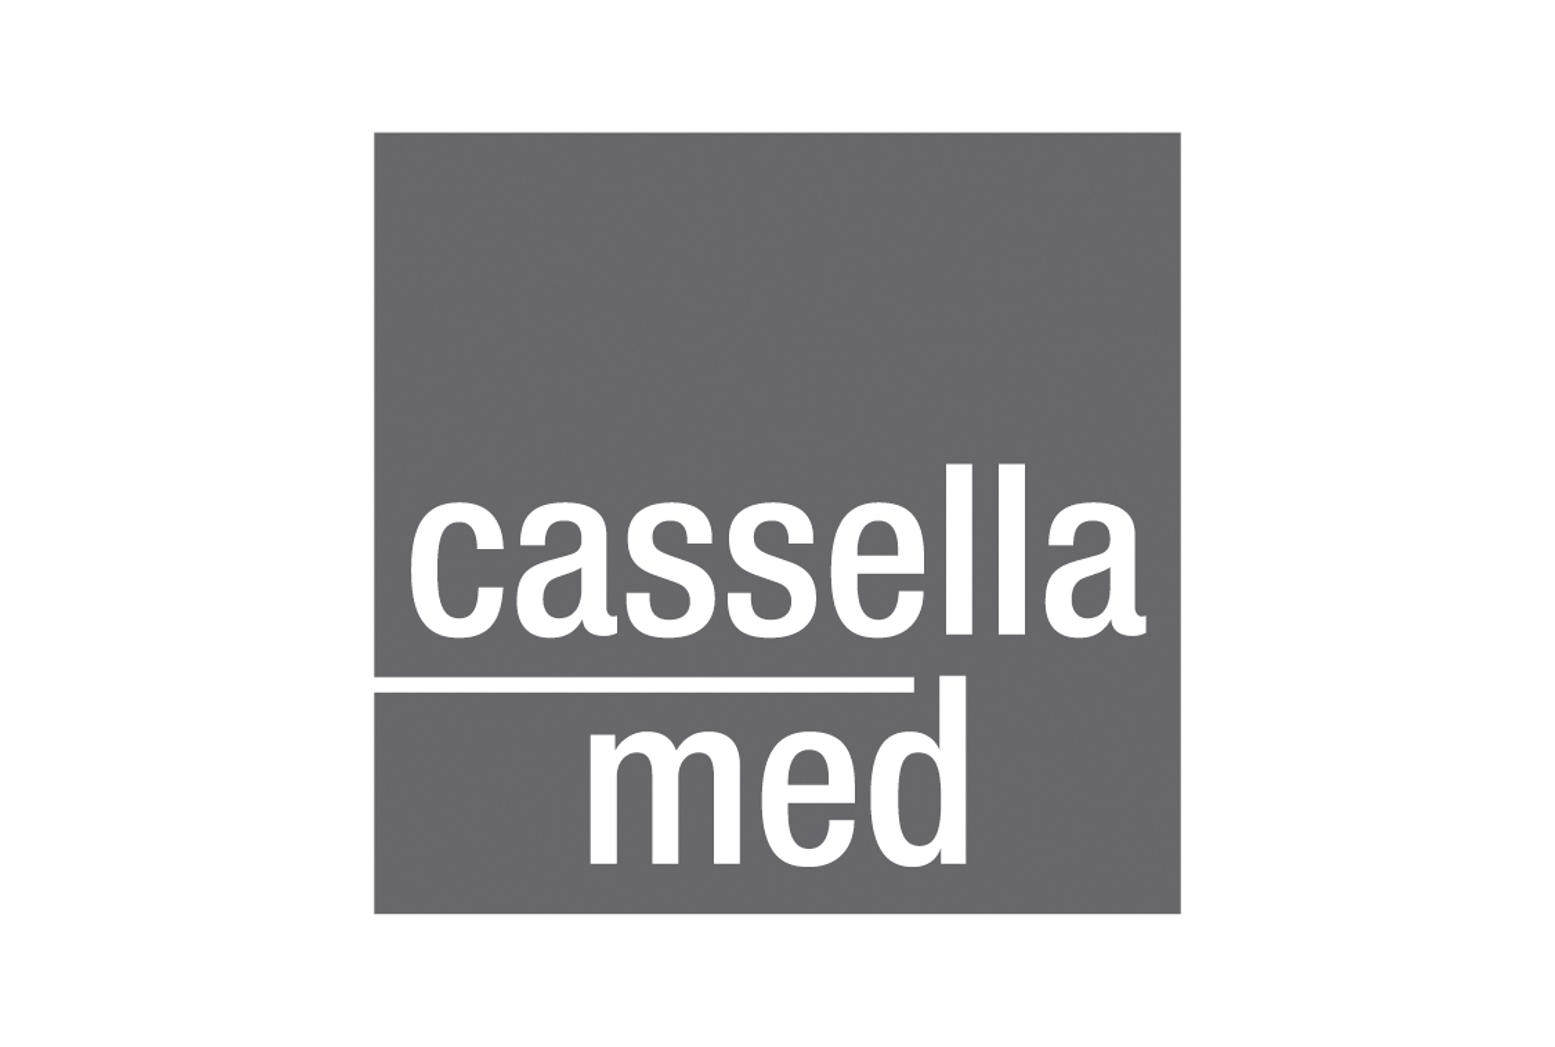 casellamed-150